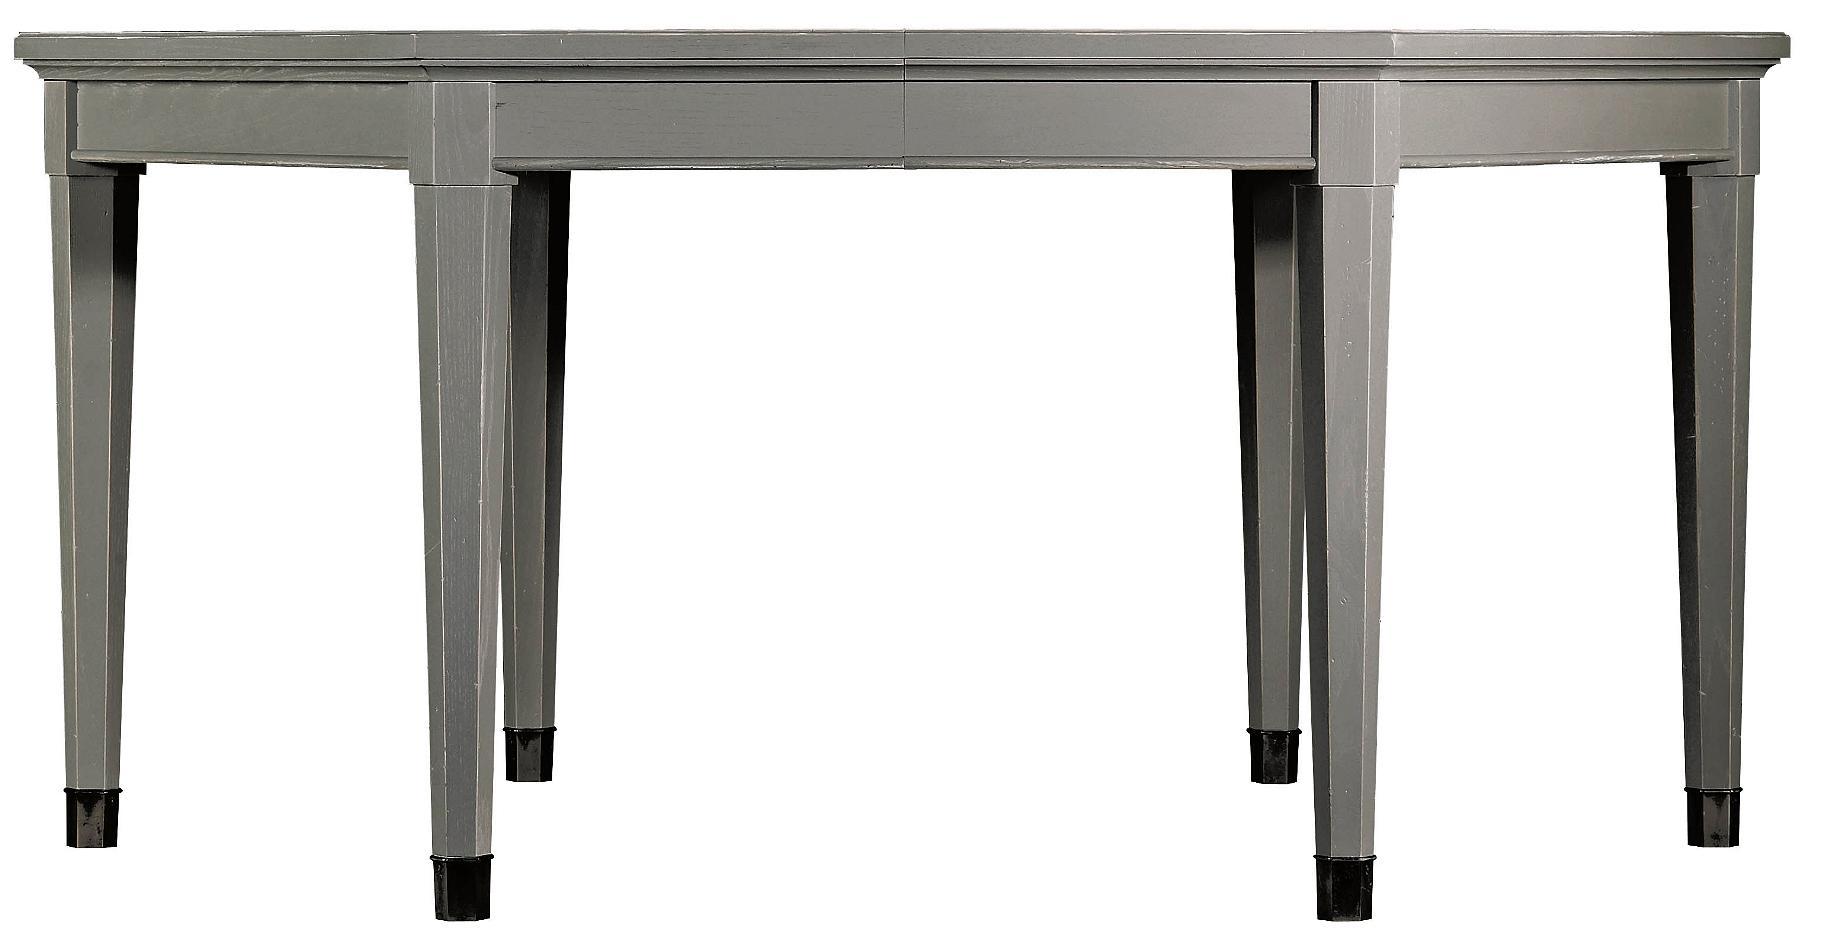 Stanley Furniture Coastal Living Resort Soledad Promenade Leg Table - Item Number: 062-B1-32